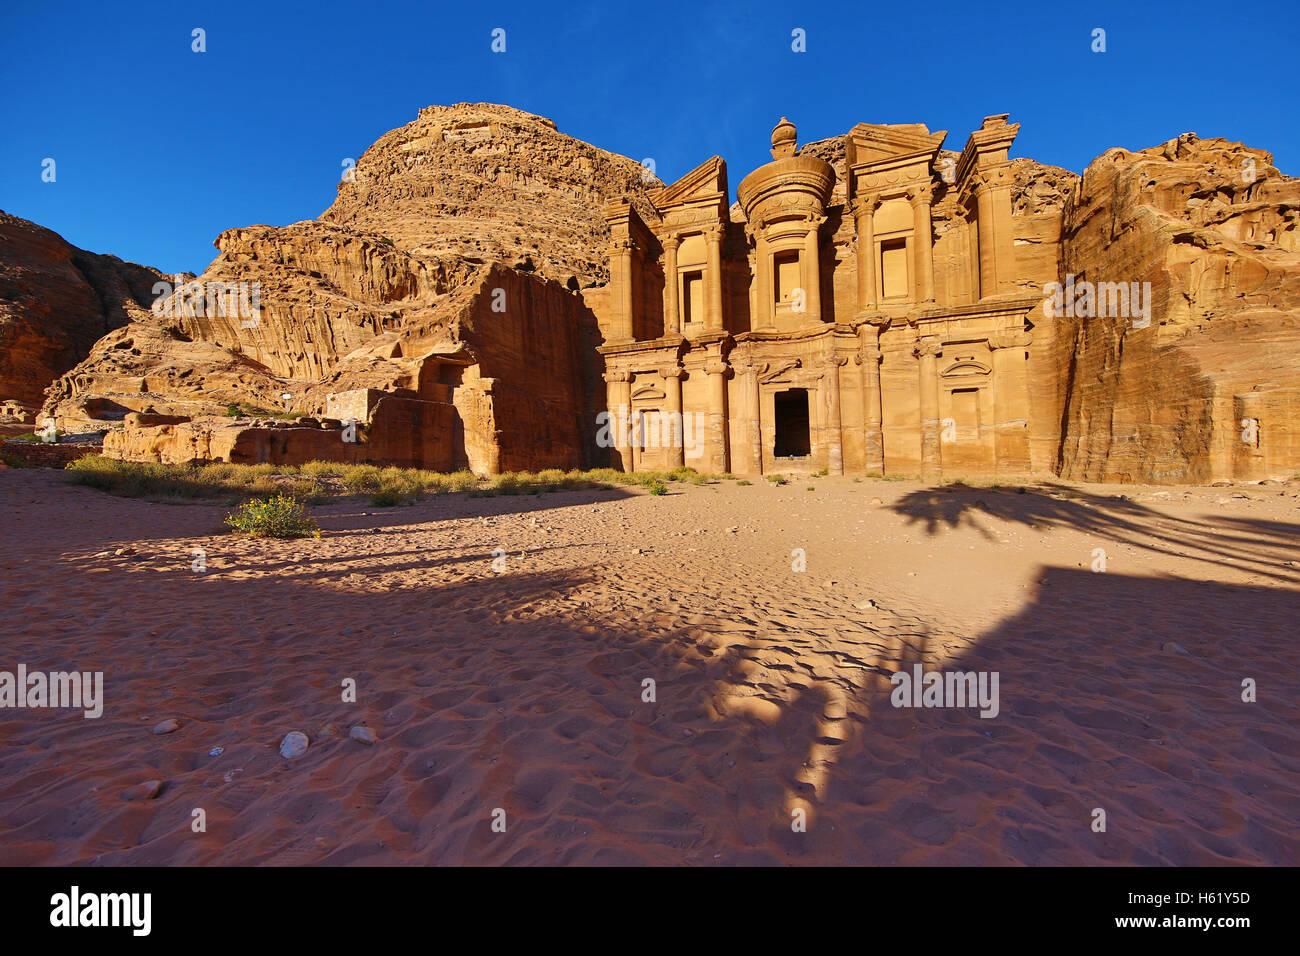 Das Kloster, Ad-Deir, in die Felsenstadt Petra, Jordanien Stockbild